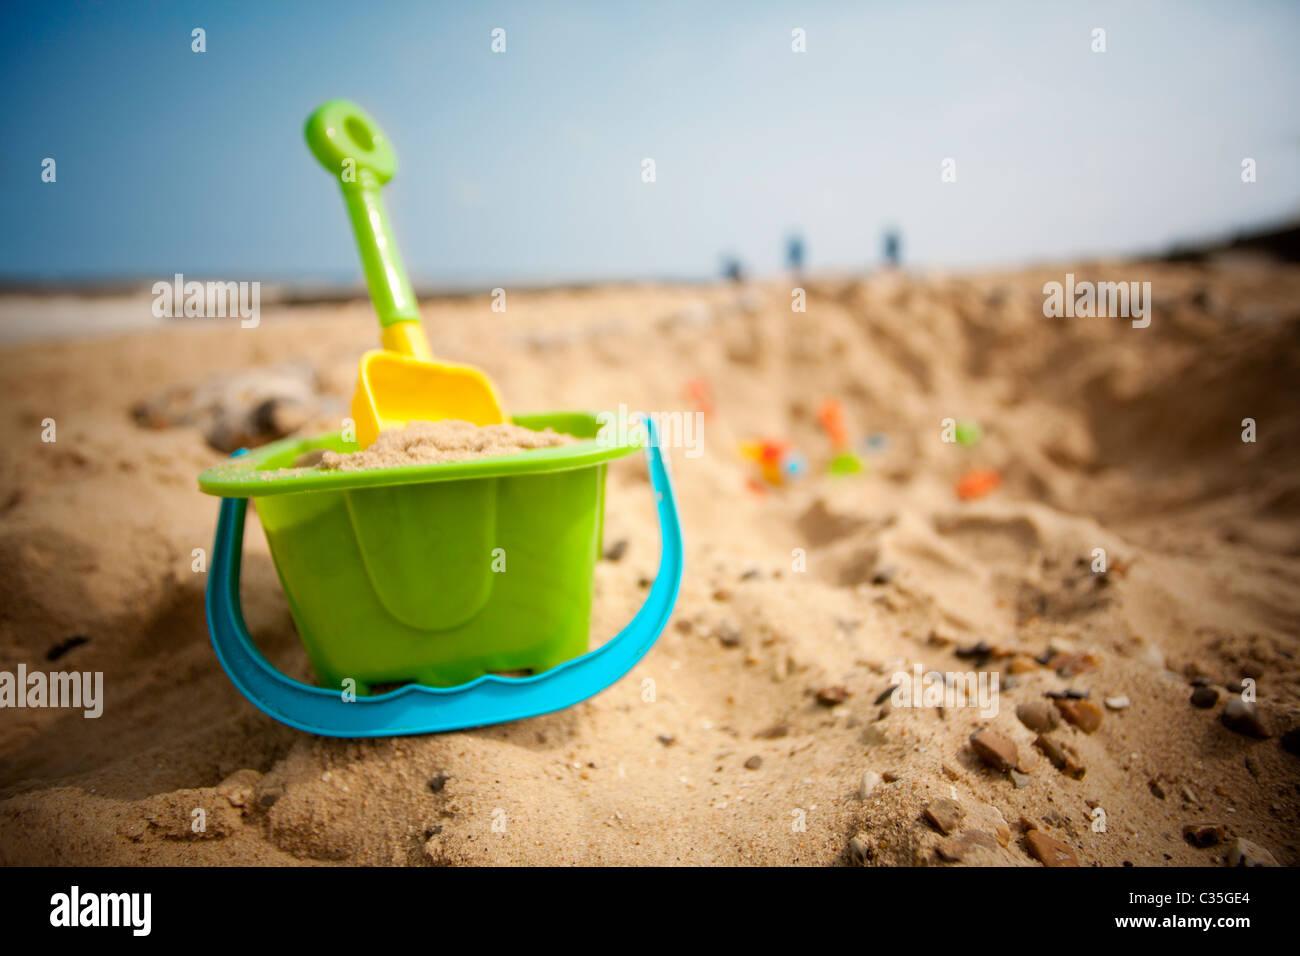 Bucket and spade on beach - Stock Image